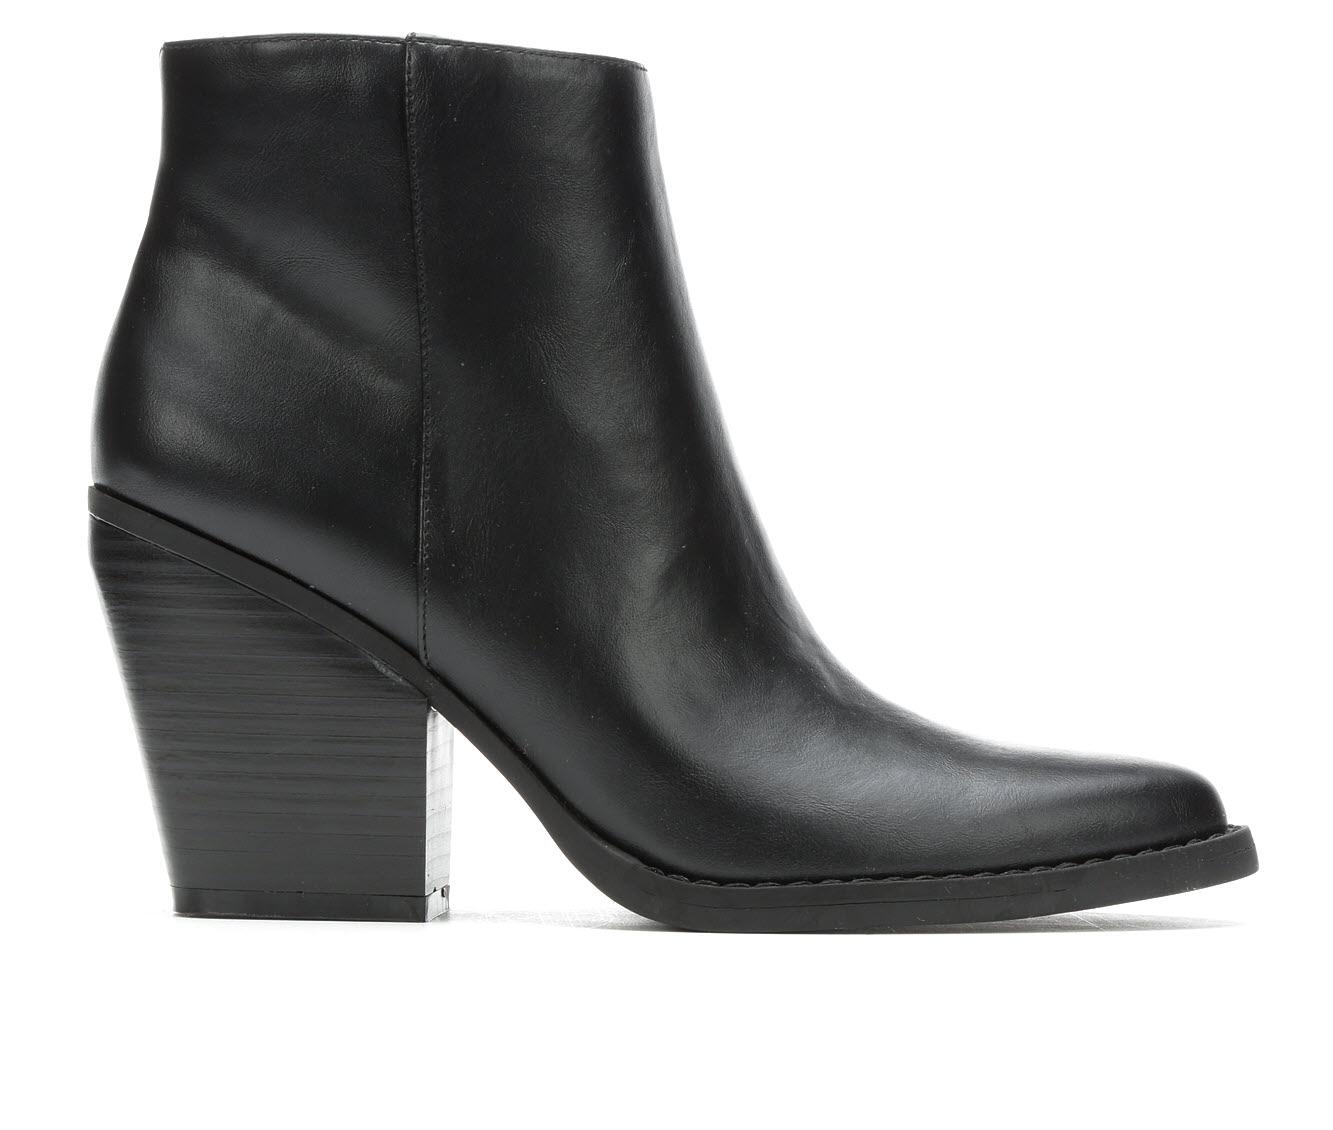 Madden Girl Klicck Women's Boot (Black Faux Leather)